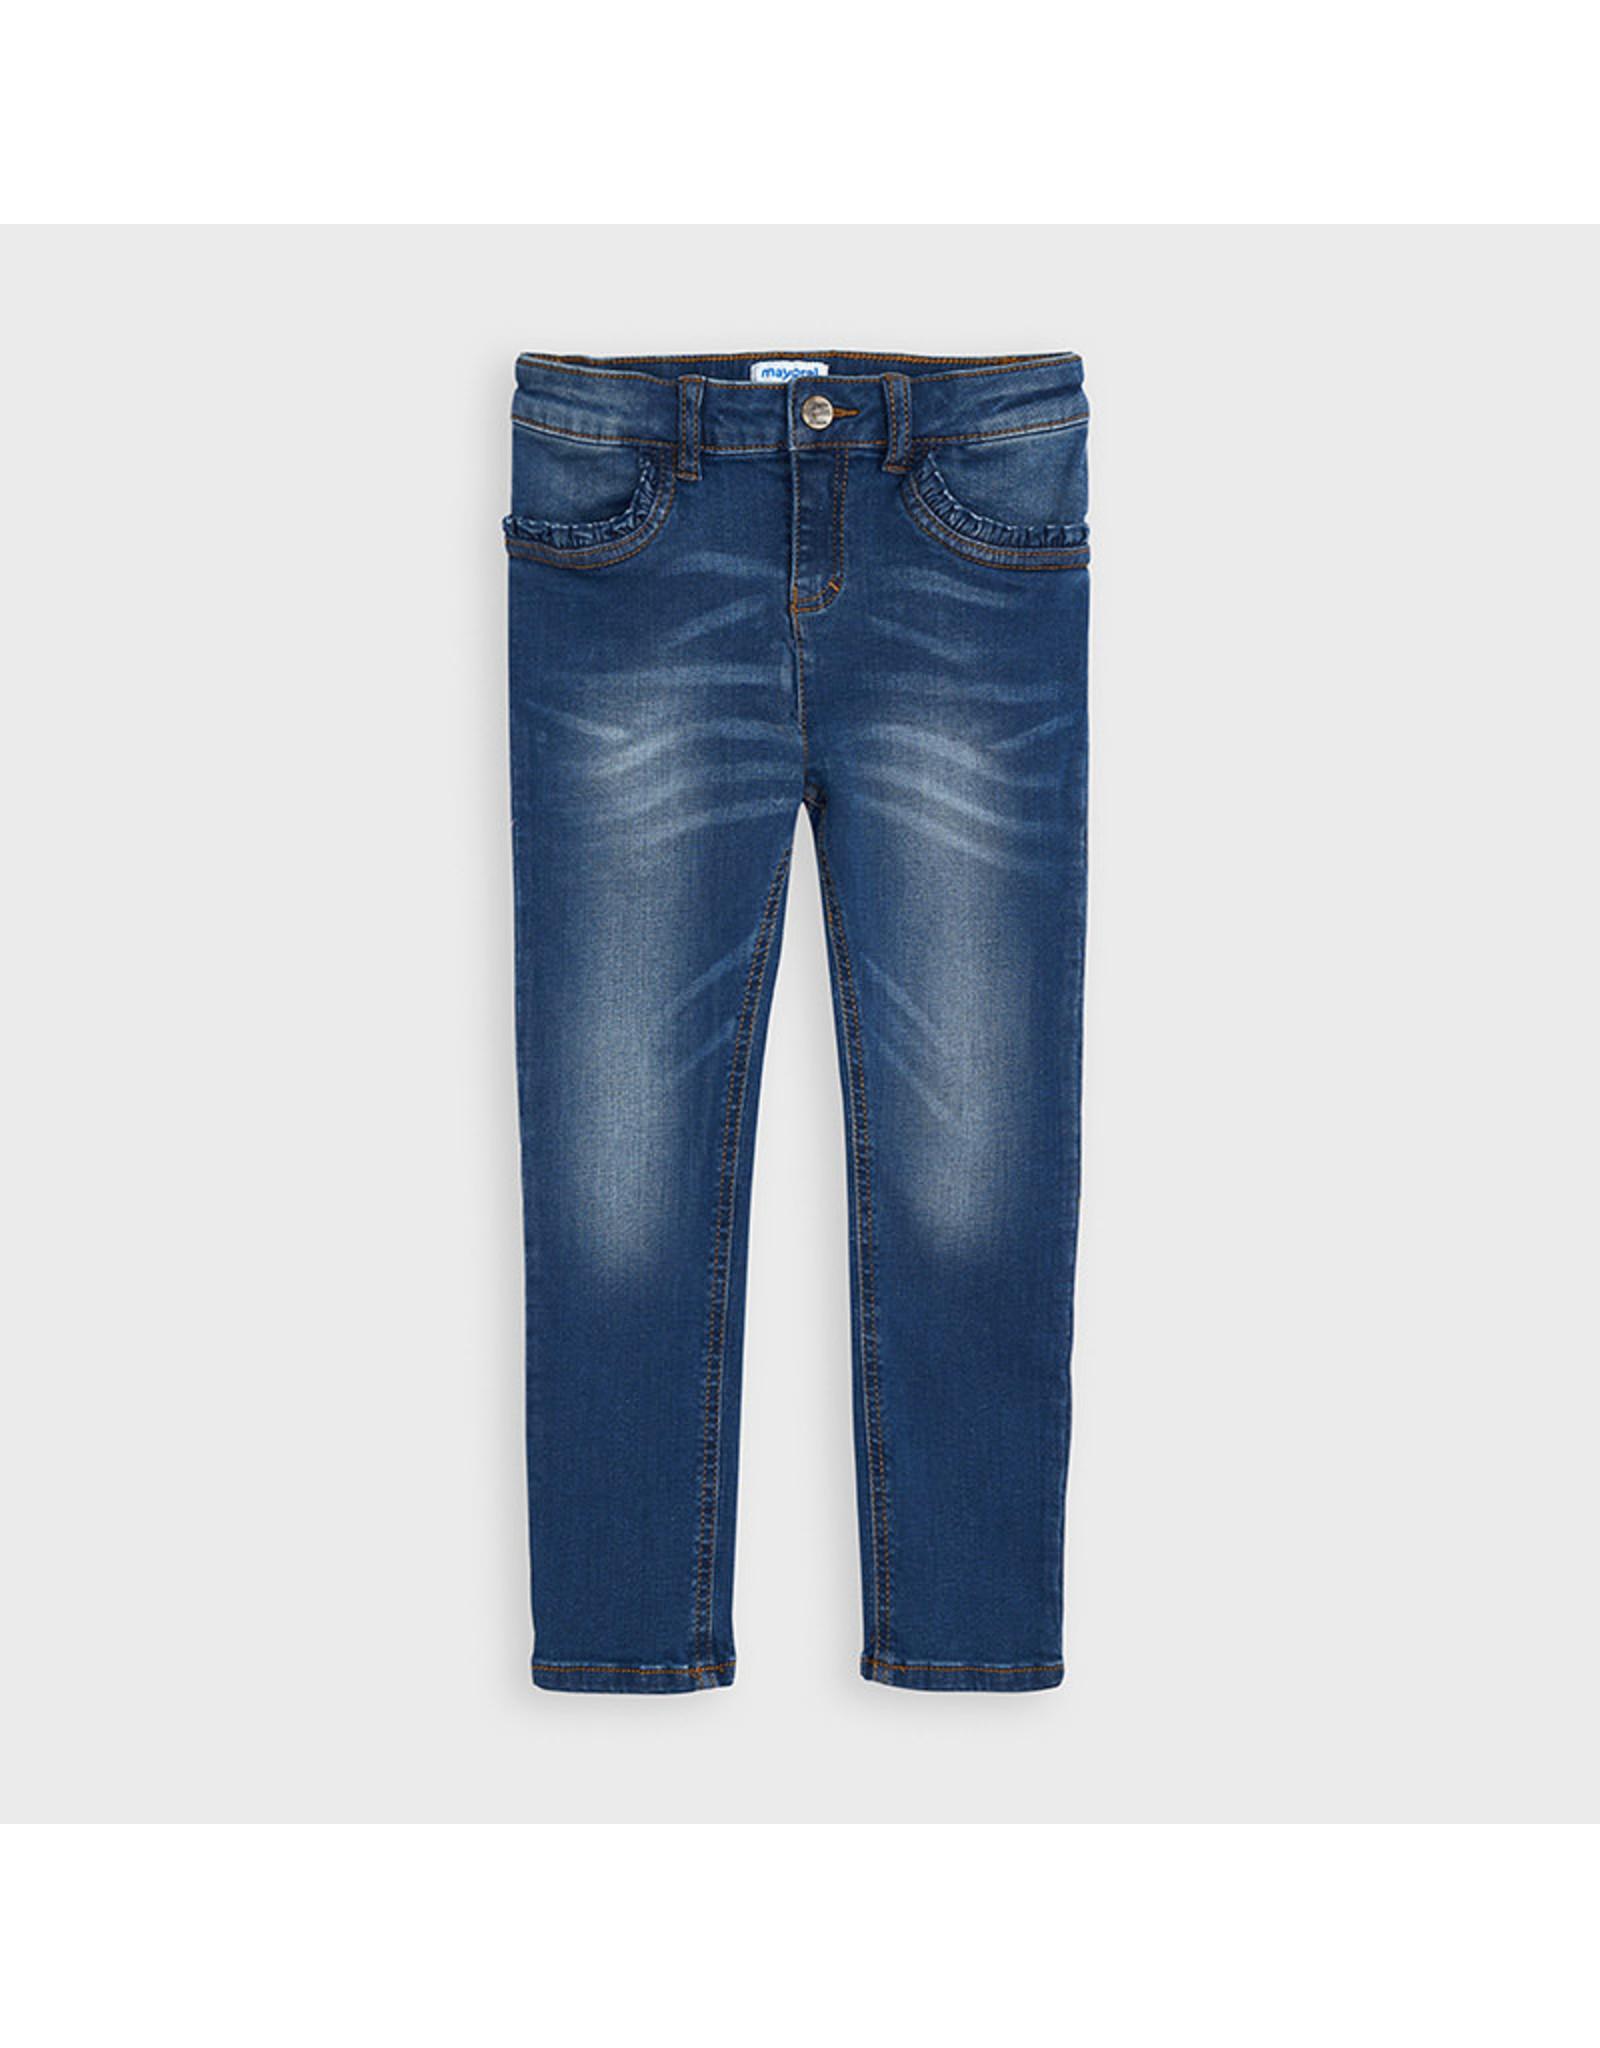 Mayoral Skinny Jeans